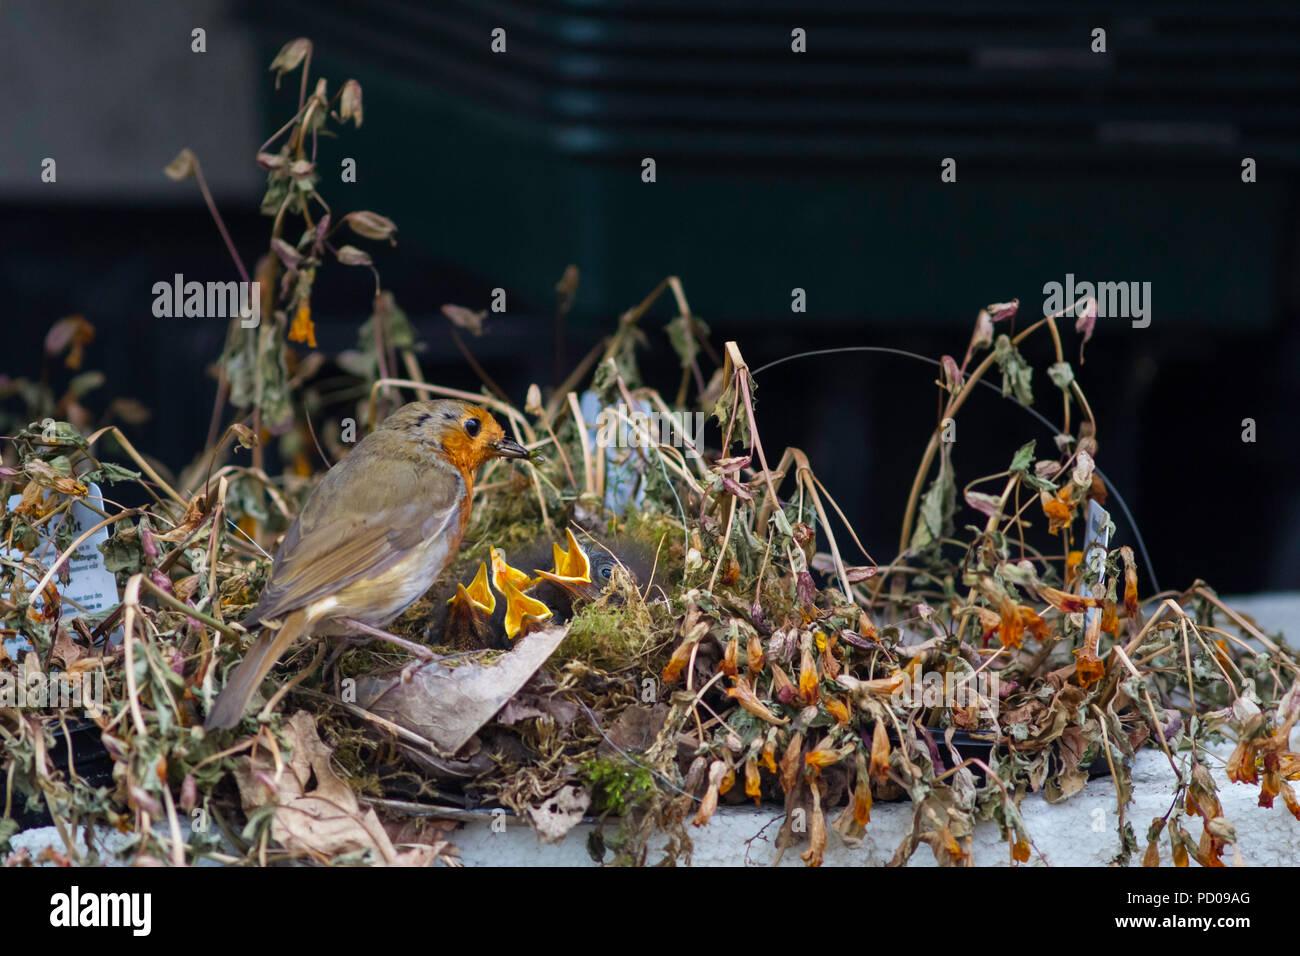 A Robin feeding chicks in a nest built in a nurserymans plant tray. - Stock Image